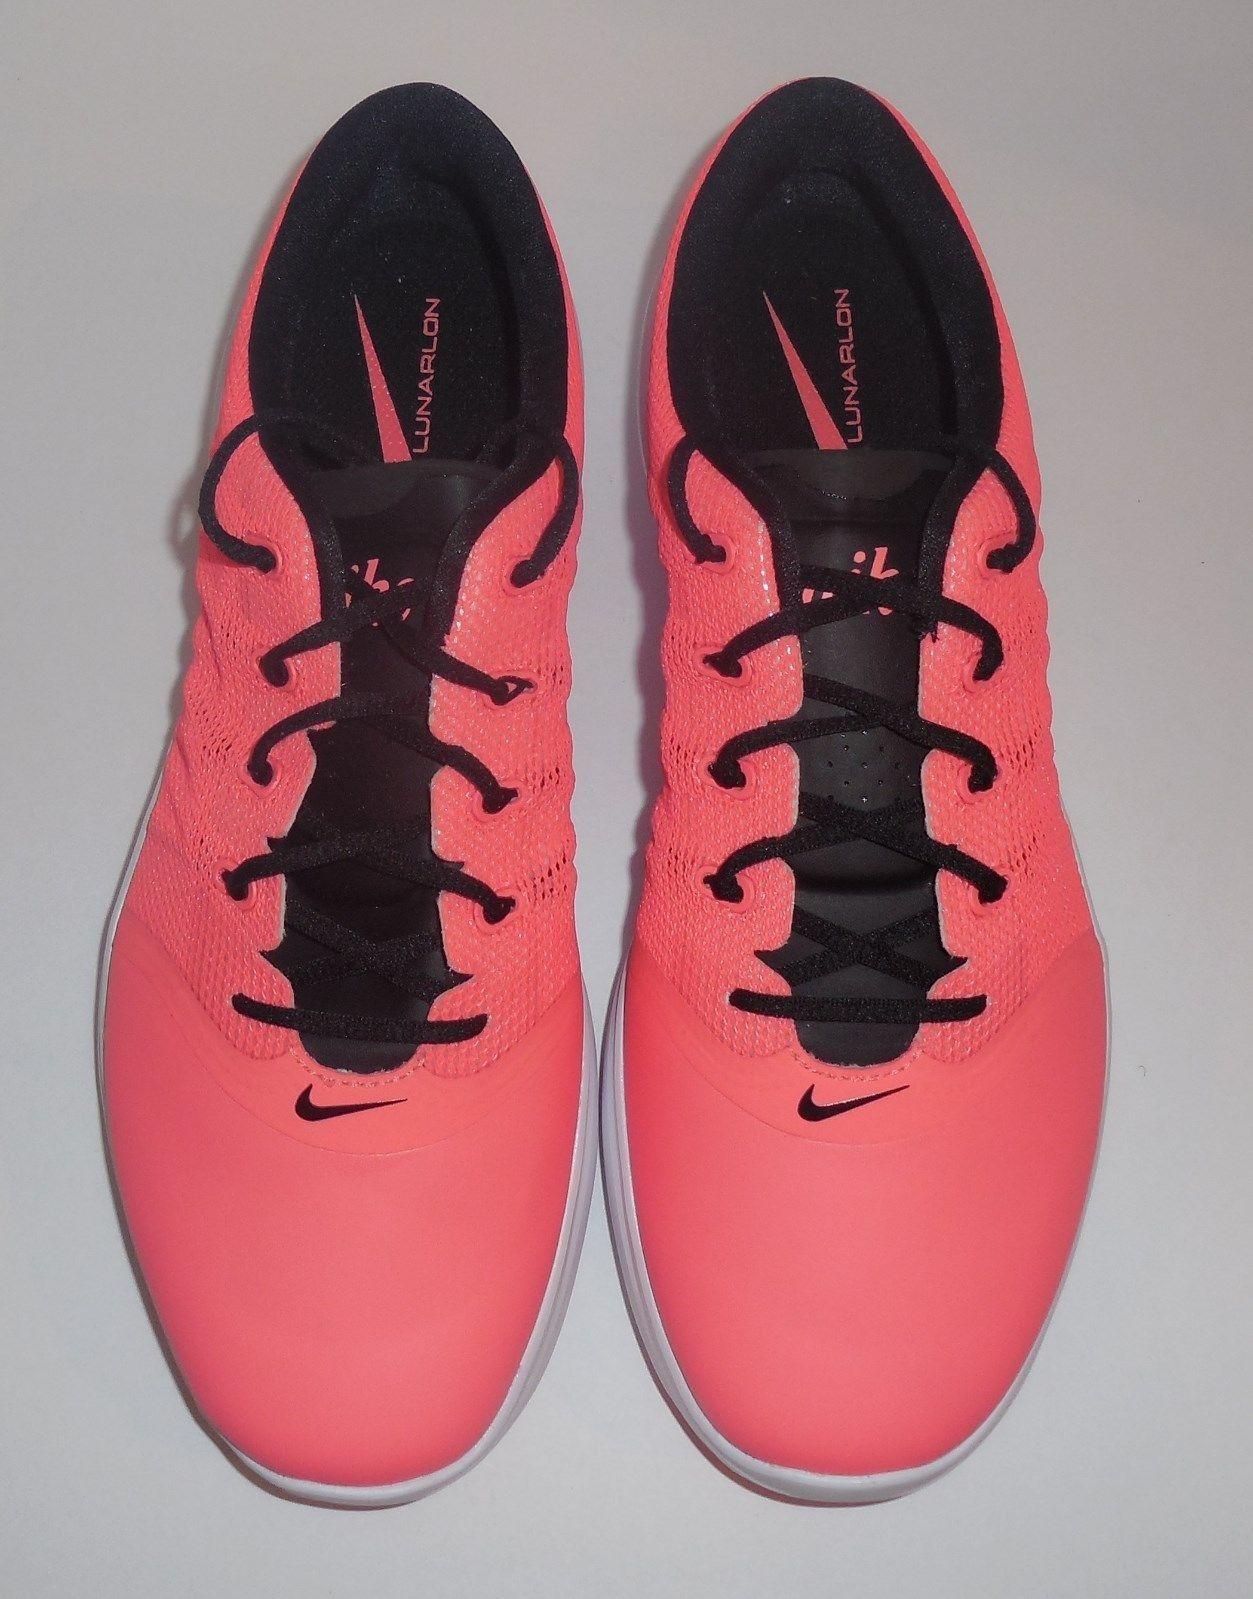 brand new aae00 980c9 NIKE Lunar Empress 2 Womens Size 10 Golf Shoes Lava Black White New 819040- 600